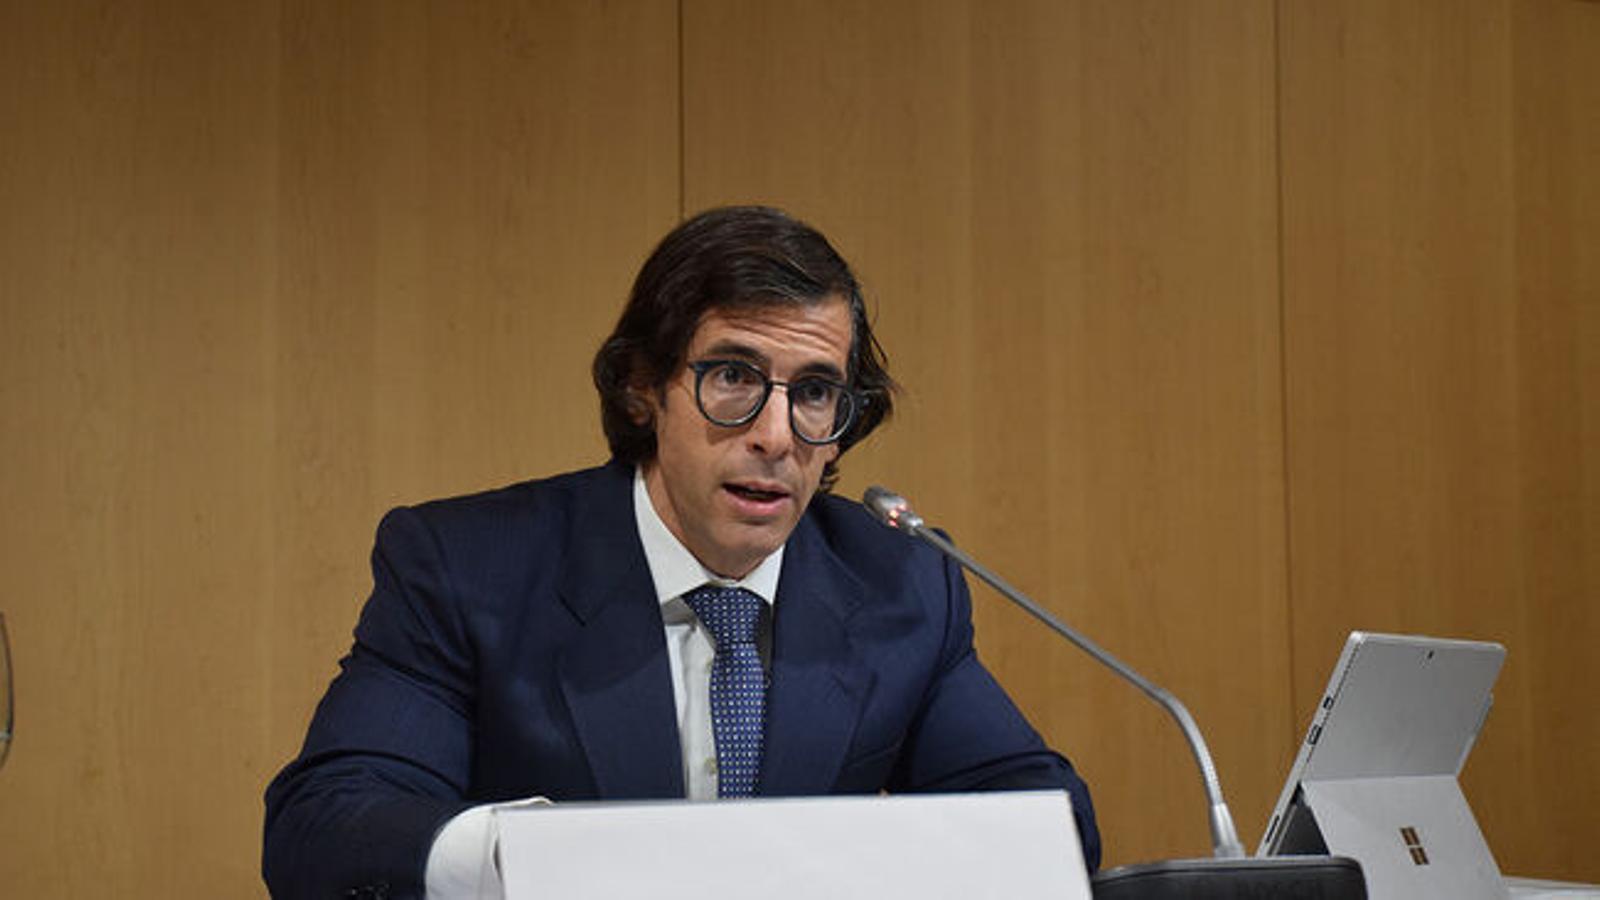 Ramón López, en una imatge d'arxiu. / ARXIU ANA